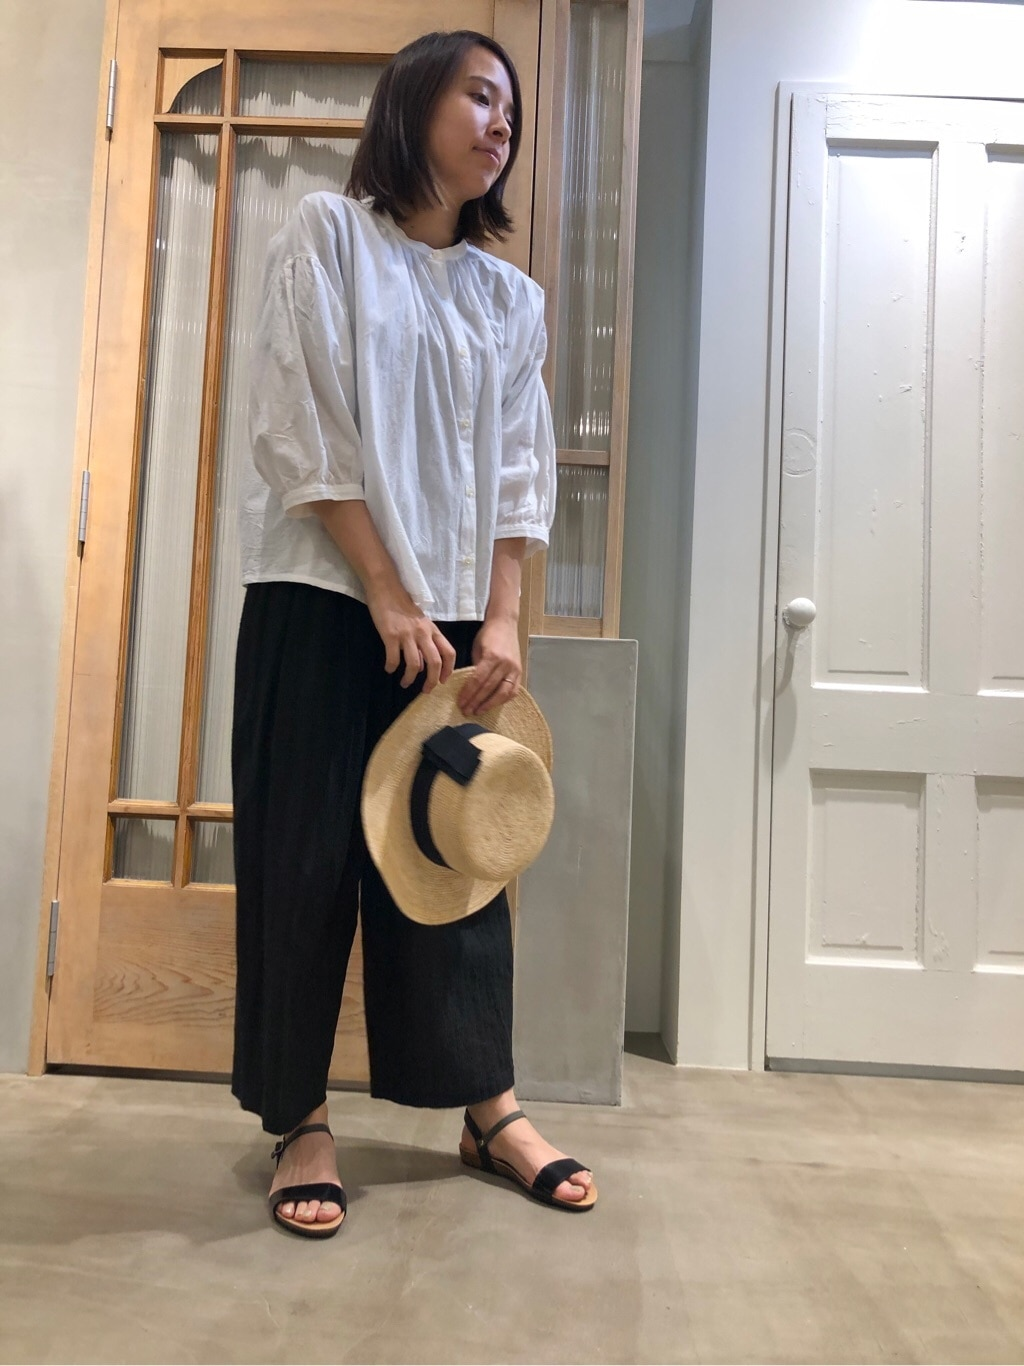 yuni / bulle de savon 京都路面 身長:157cm 2020.07.07